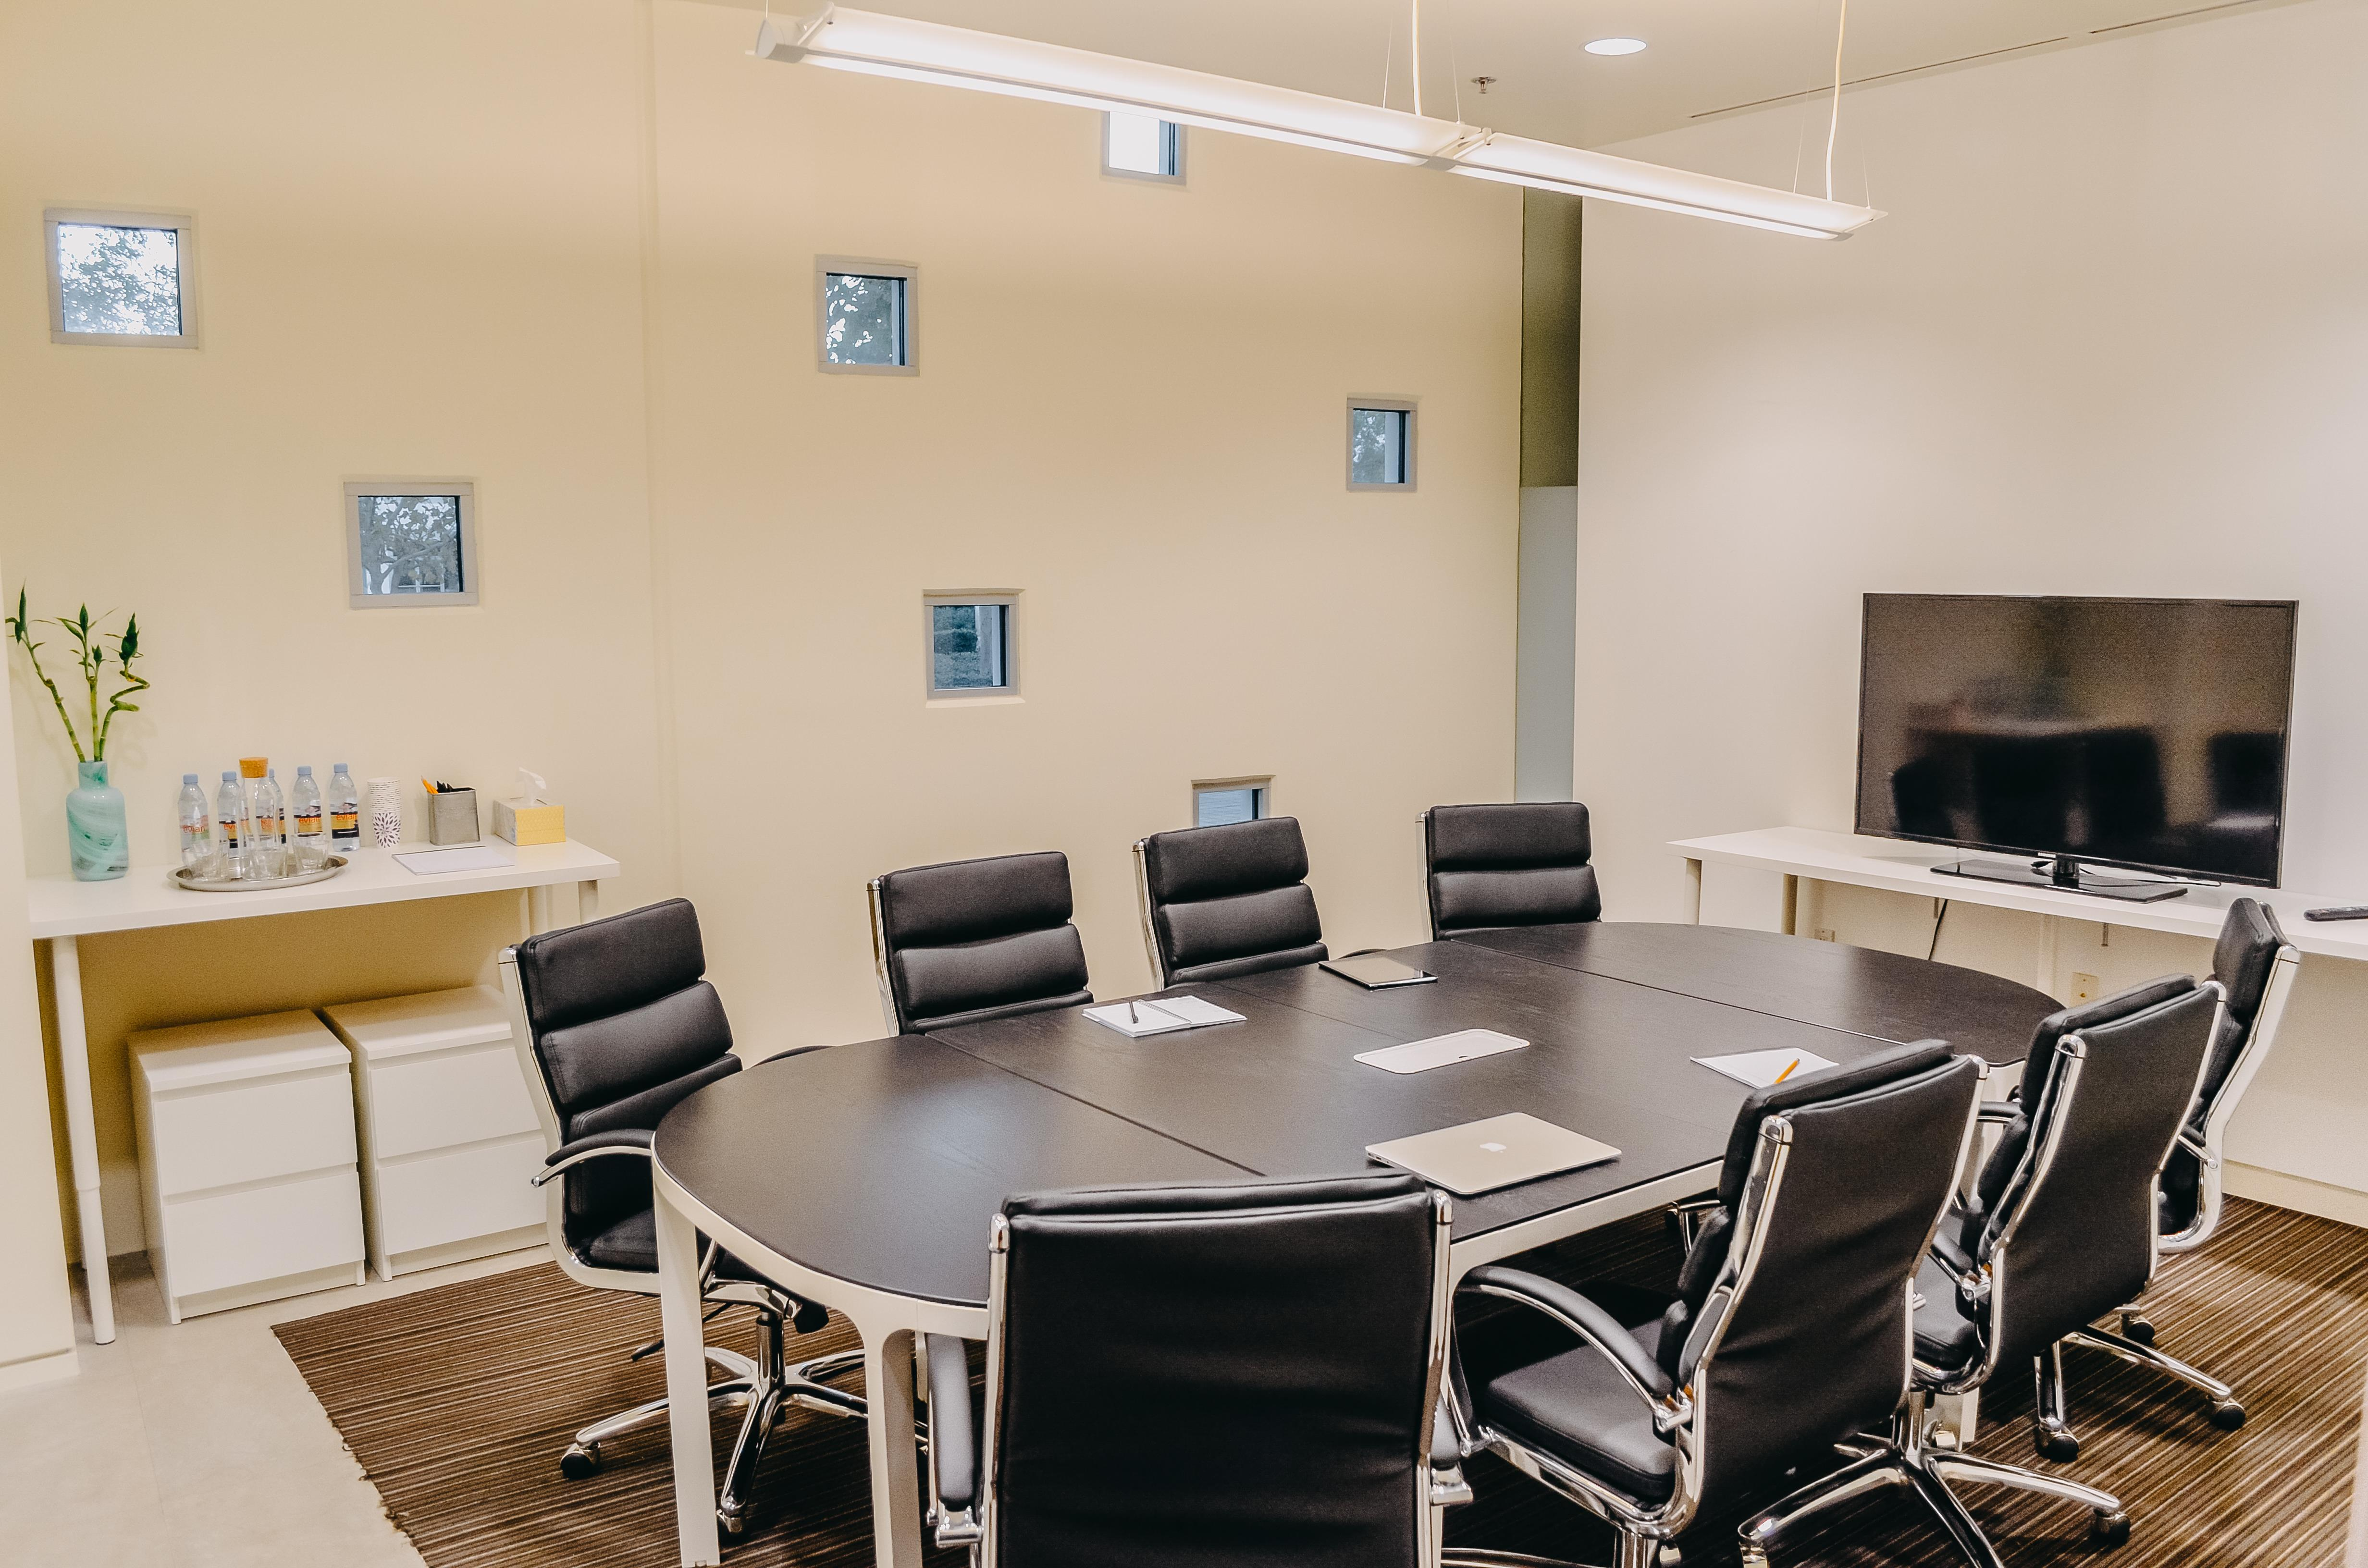 Intela-Hub - Conference Room